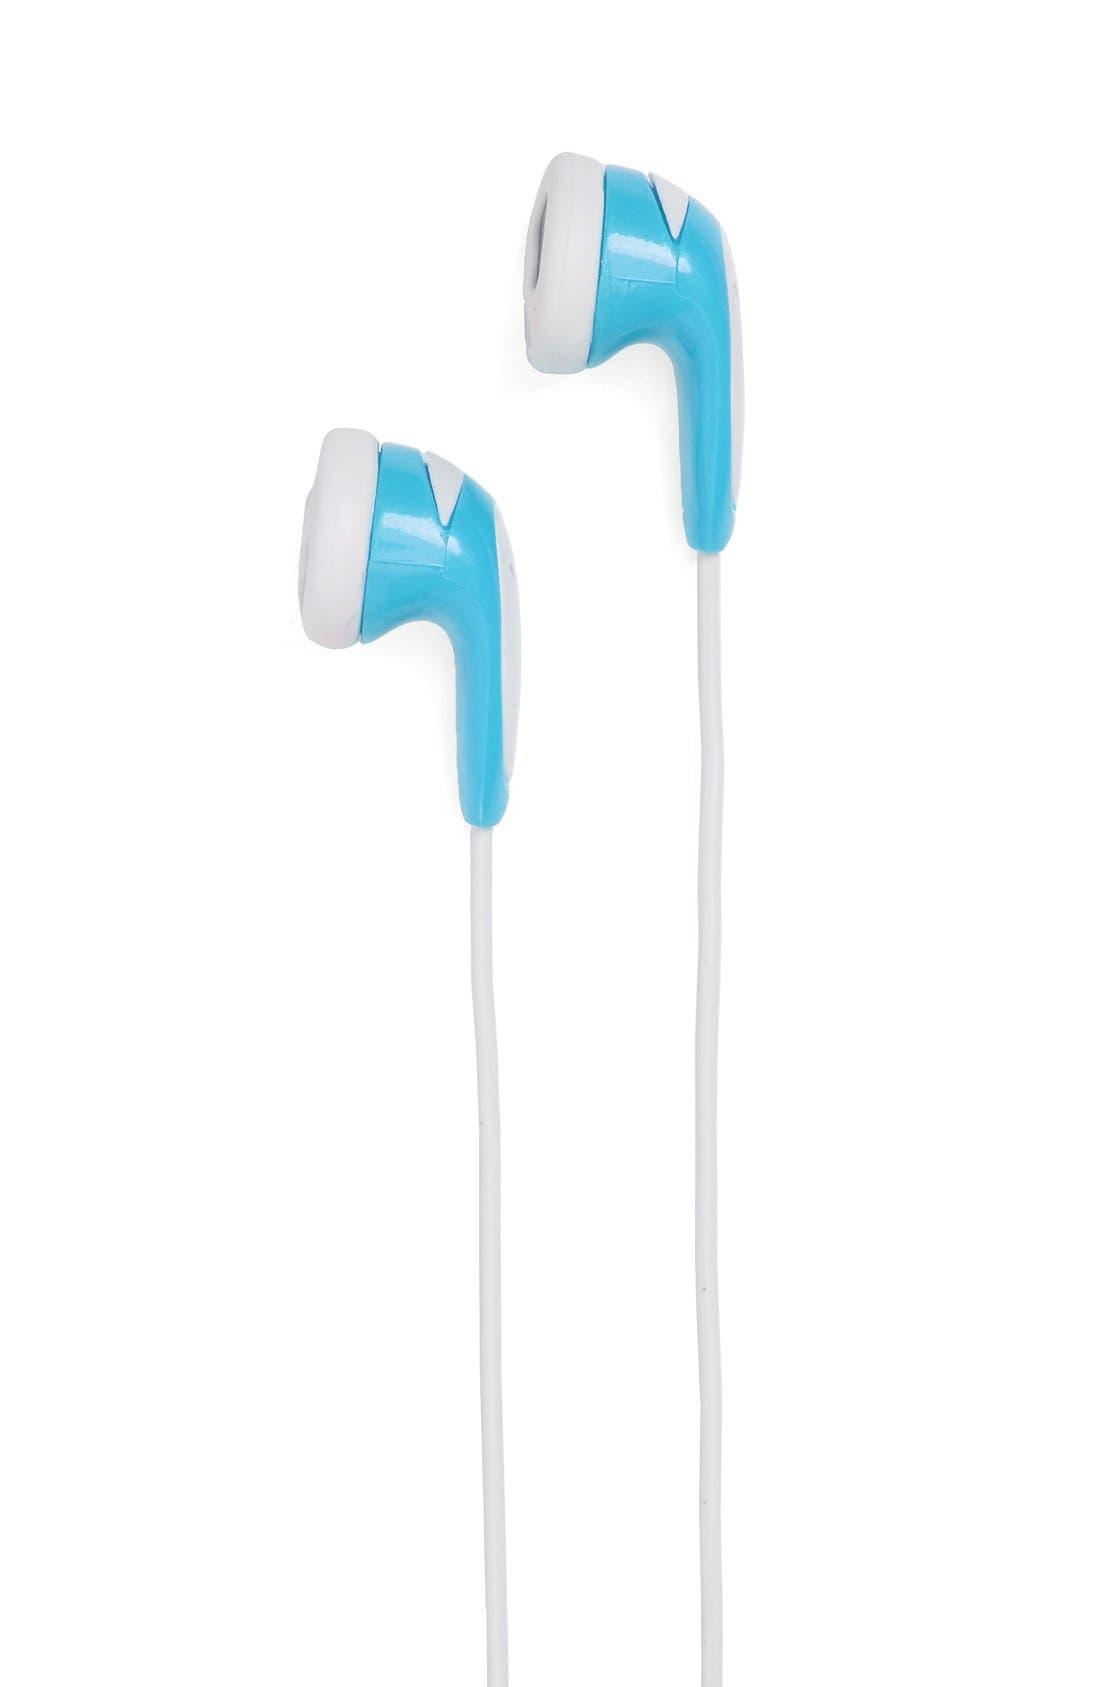 EXO Kids' Bluetooth Headphones,                             Main thumbnail 1, color,                             400